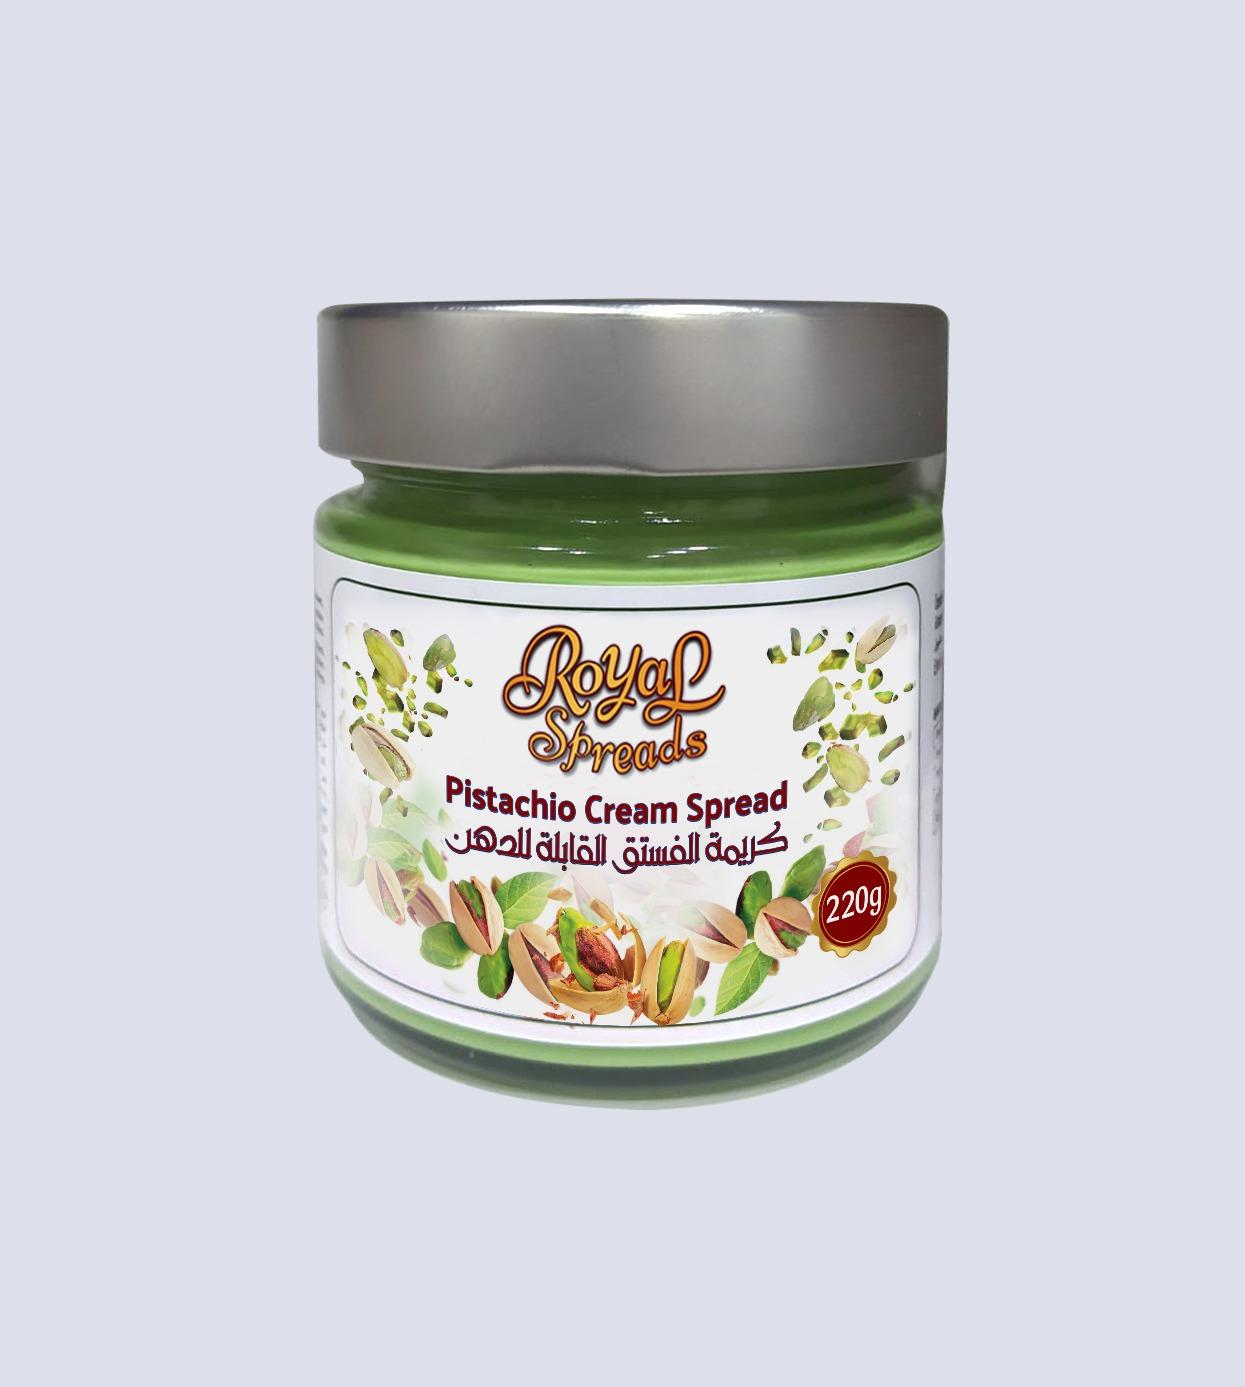 Pistachio Cream Spread - 220gr